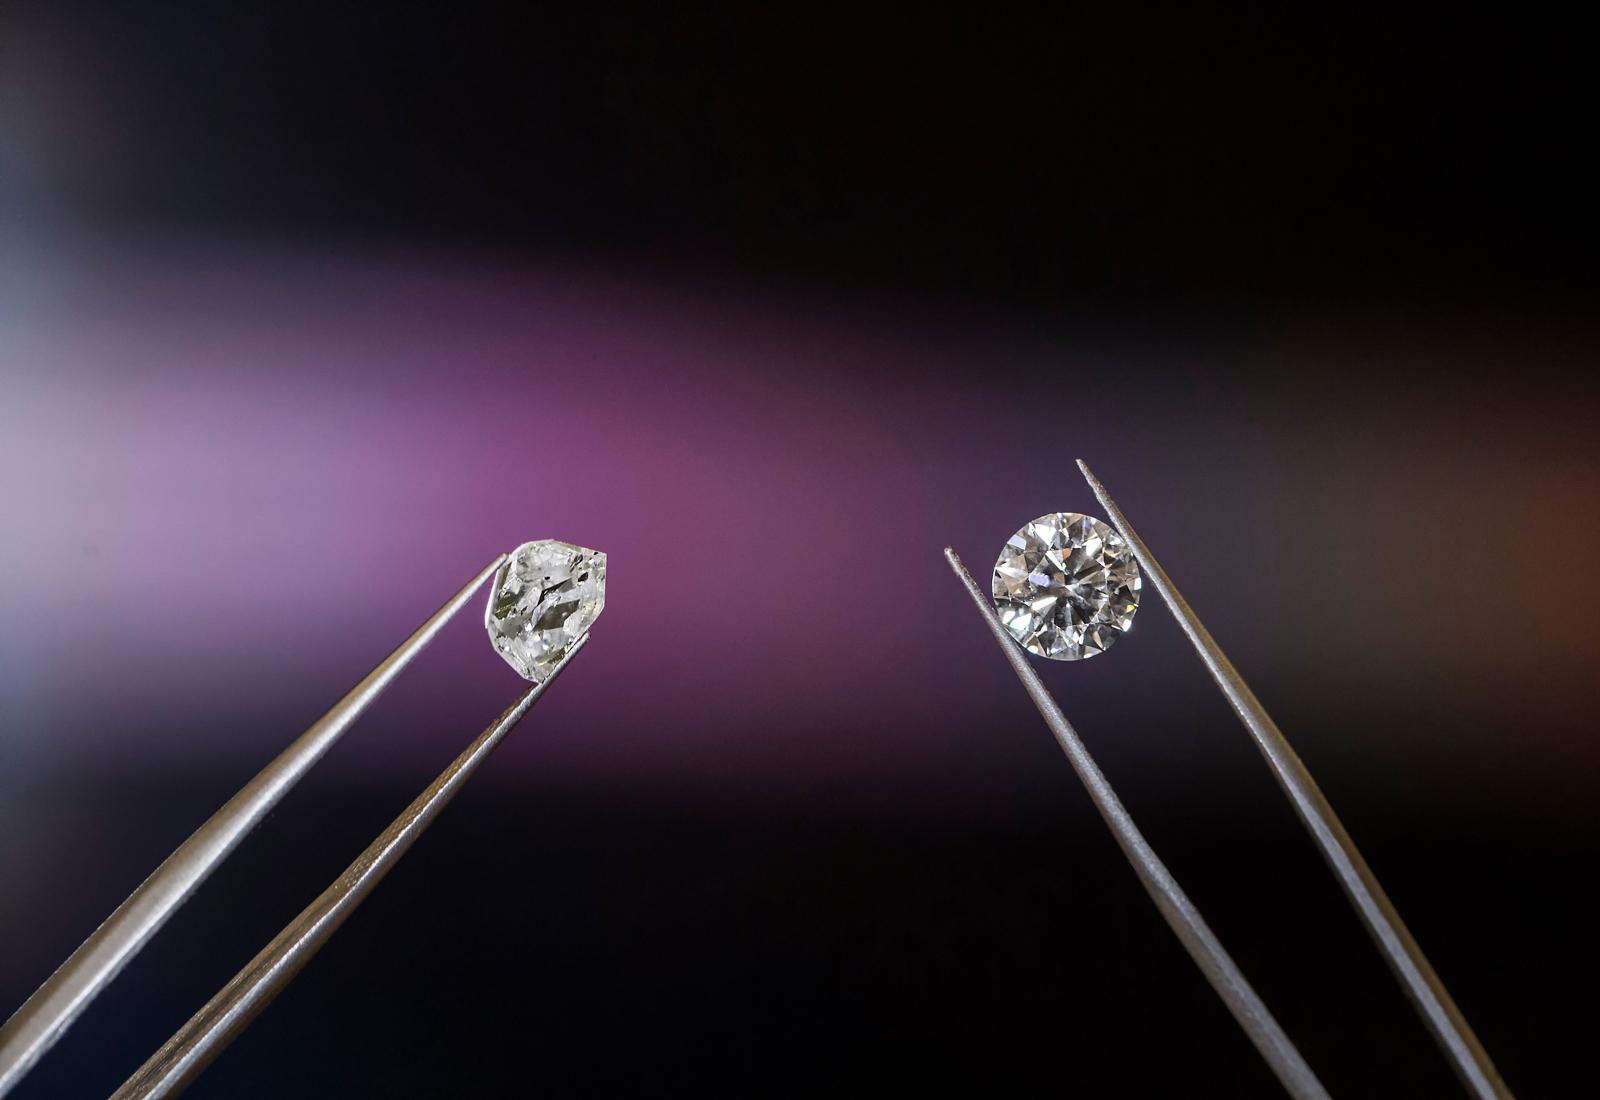 Nivoda hits 1m gemstones with total value of £2bn on B2B diamond marketplace